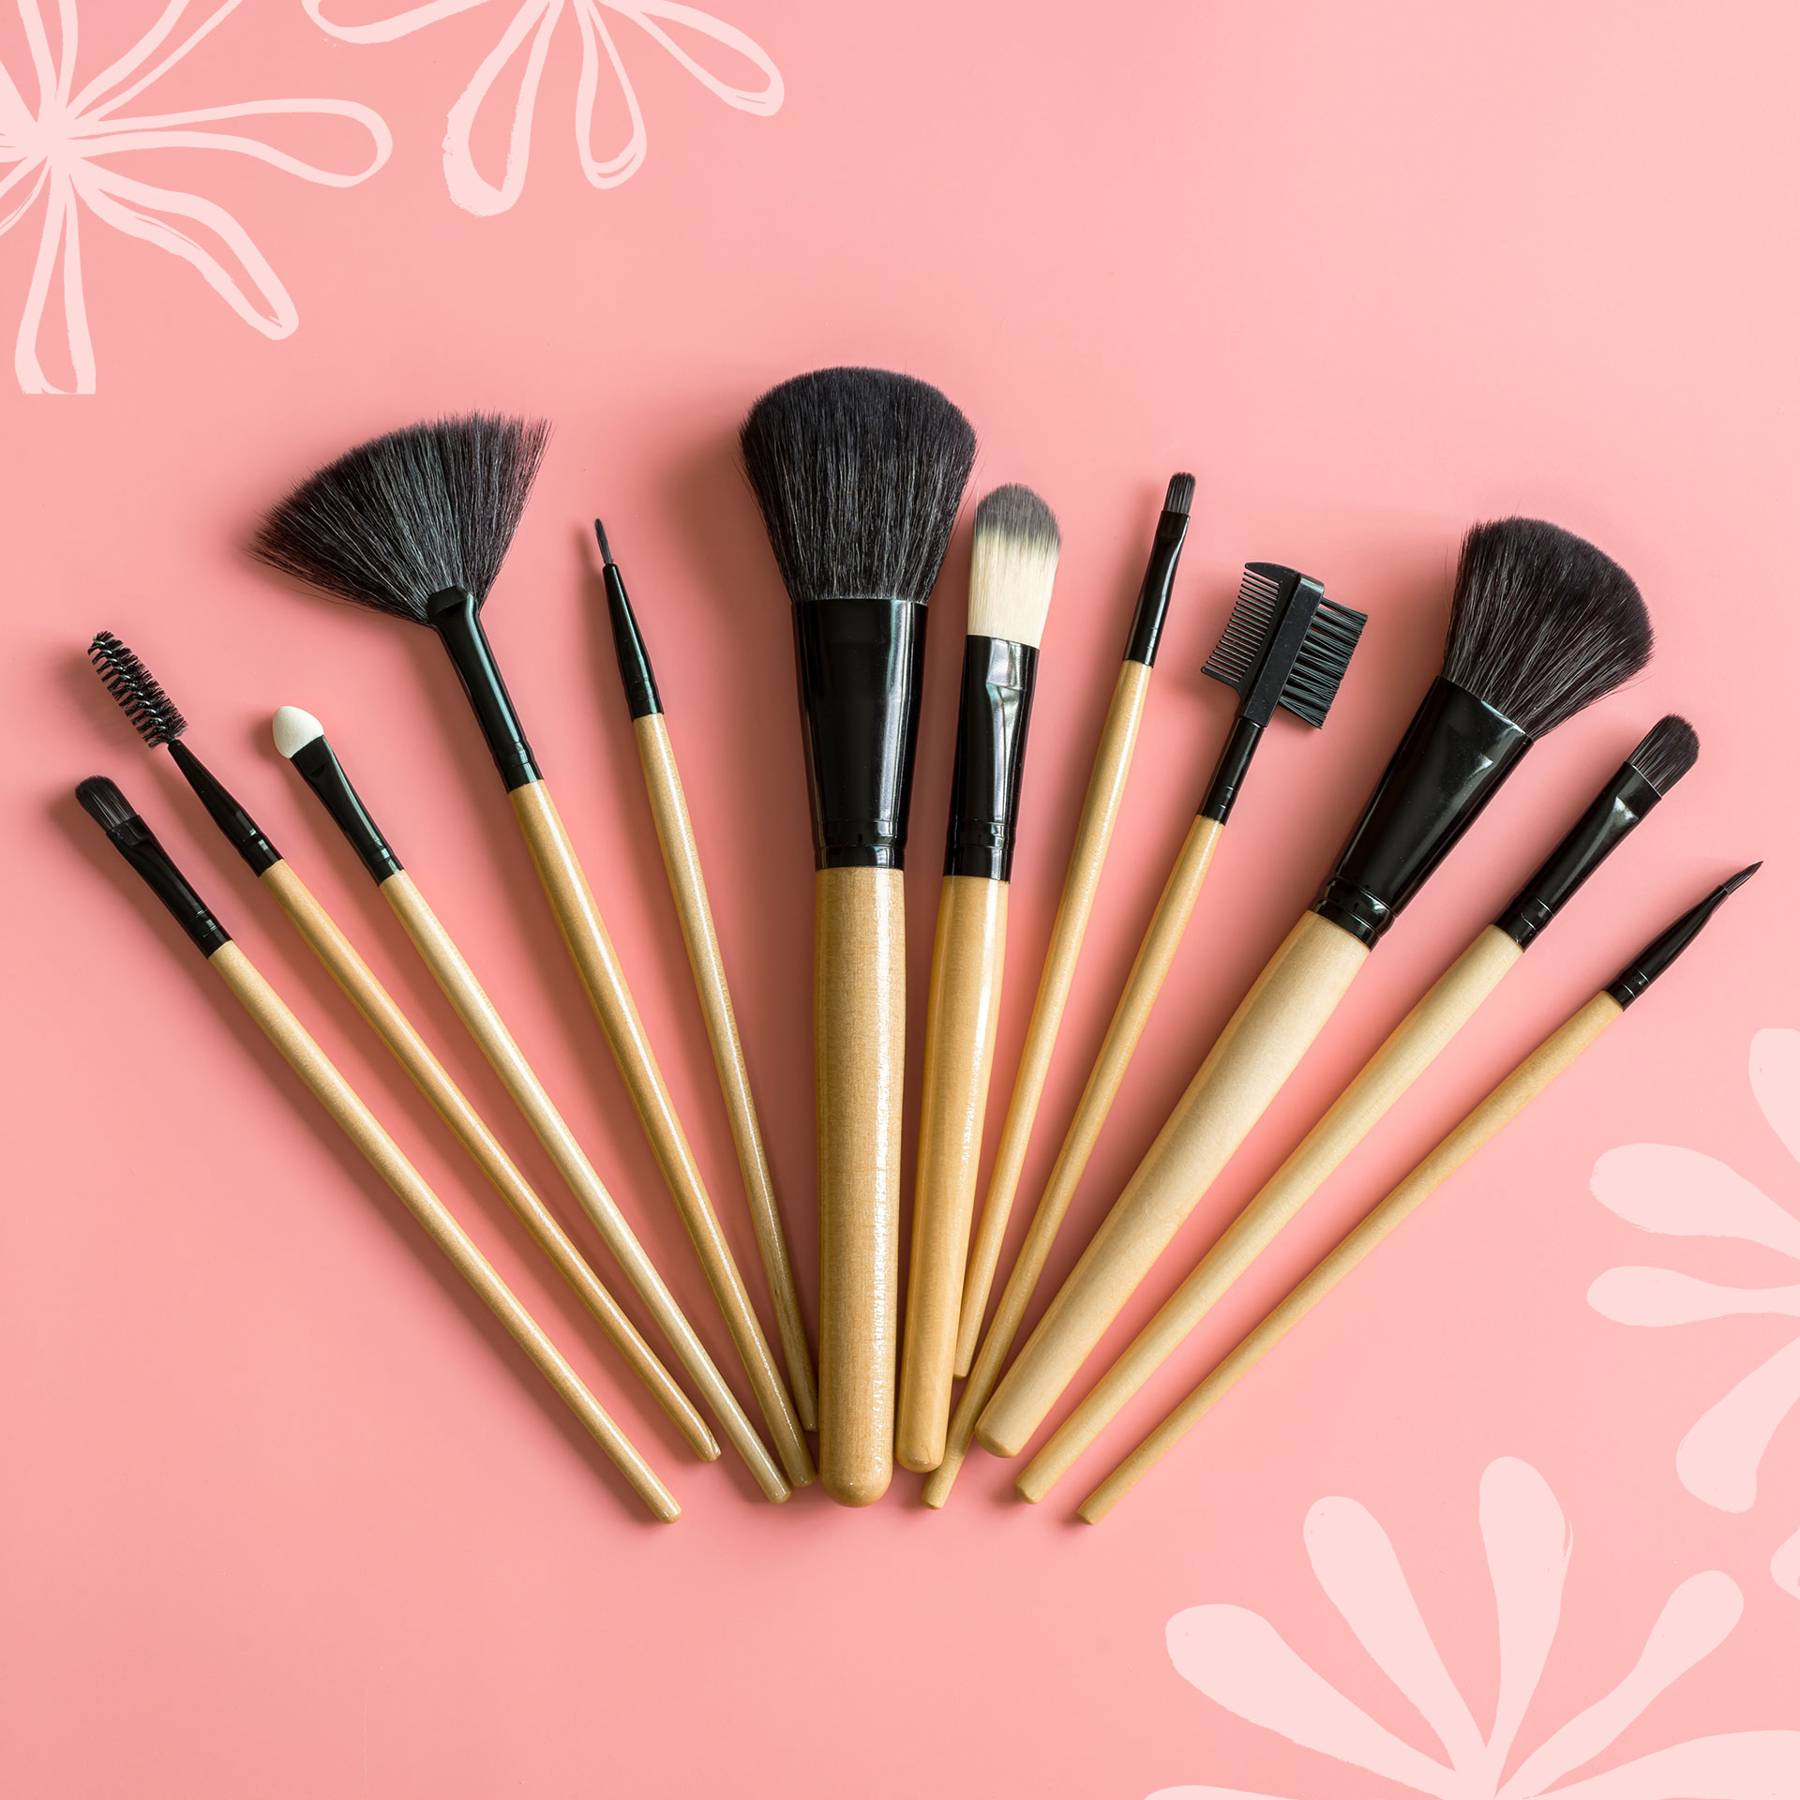 Best Makeup Brushes 2020 Best Brushes For Eyes Face Glamour Uk